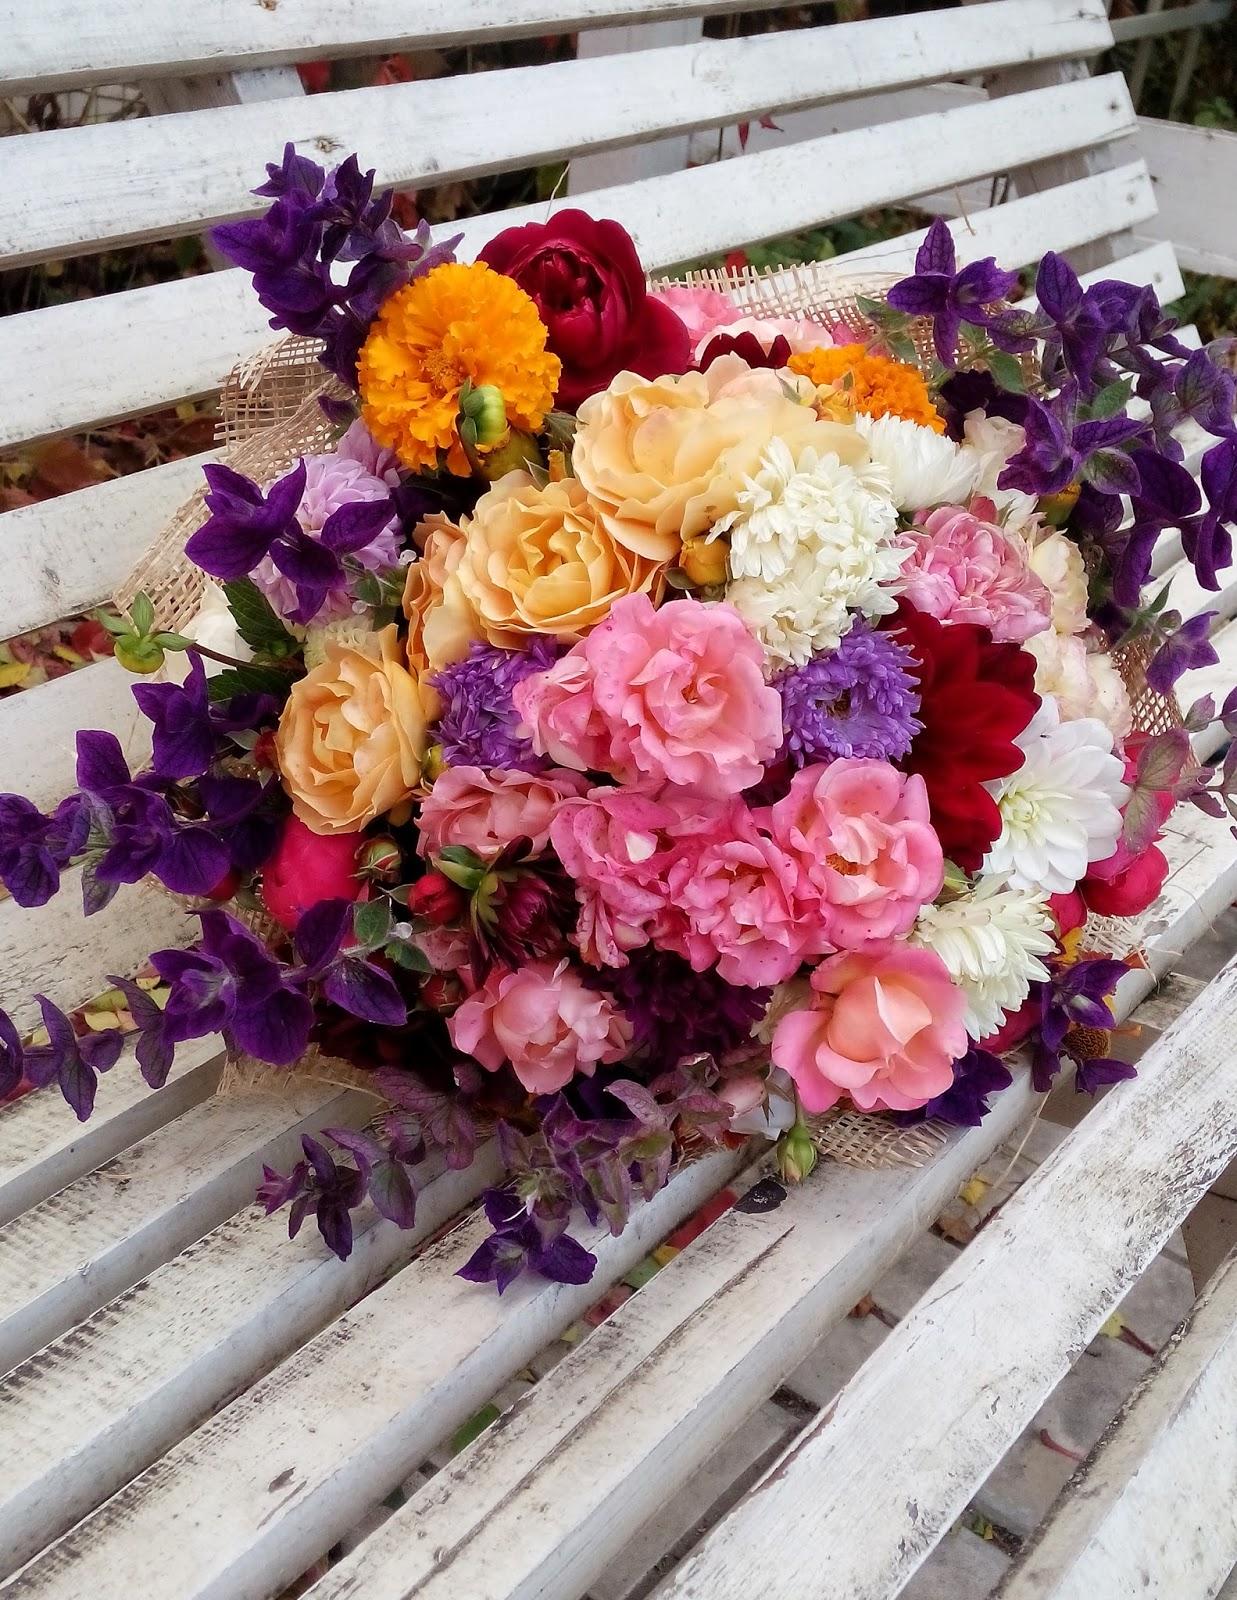 фото и название цветов цветущих с августа